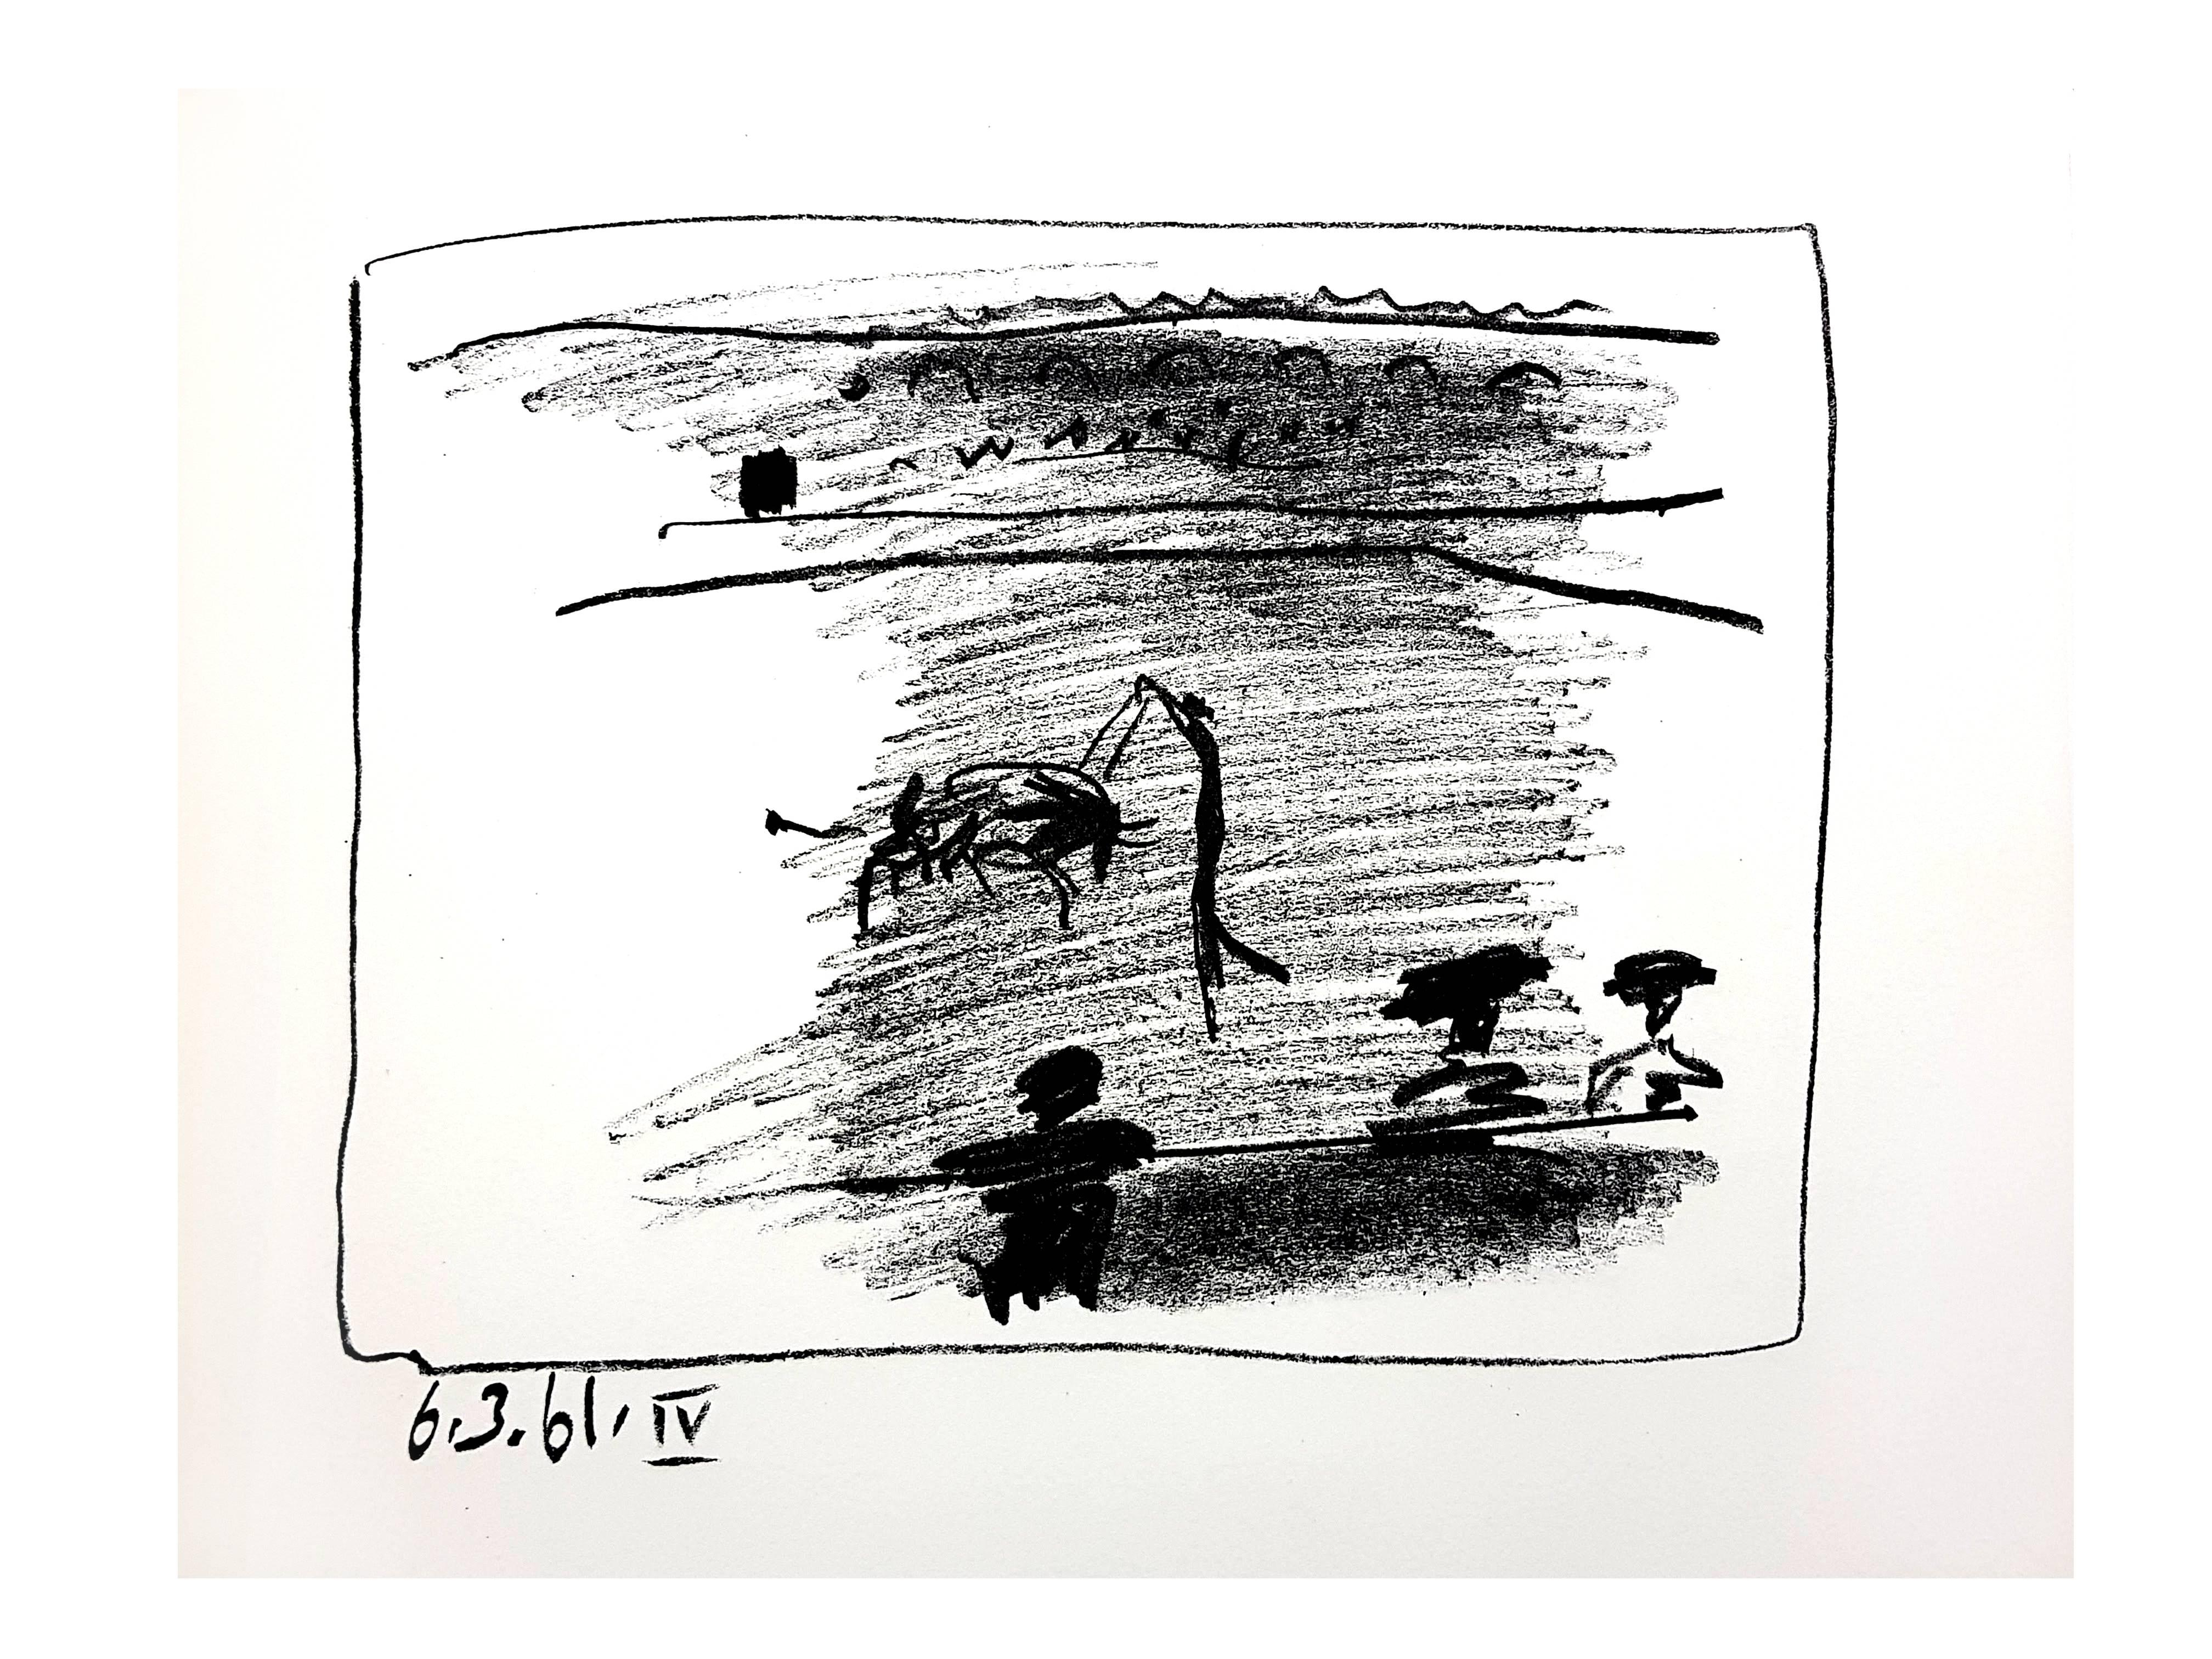 Pablo Picasso - Les Banderillas - Original Lithograph